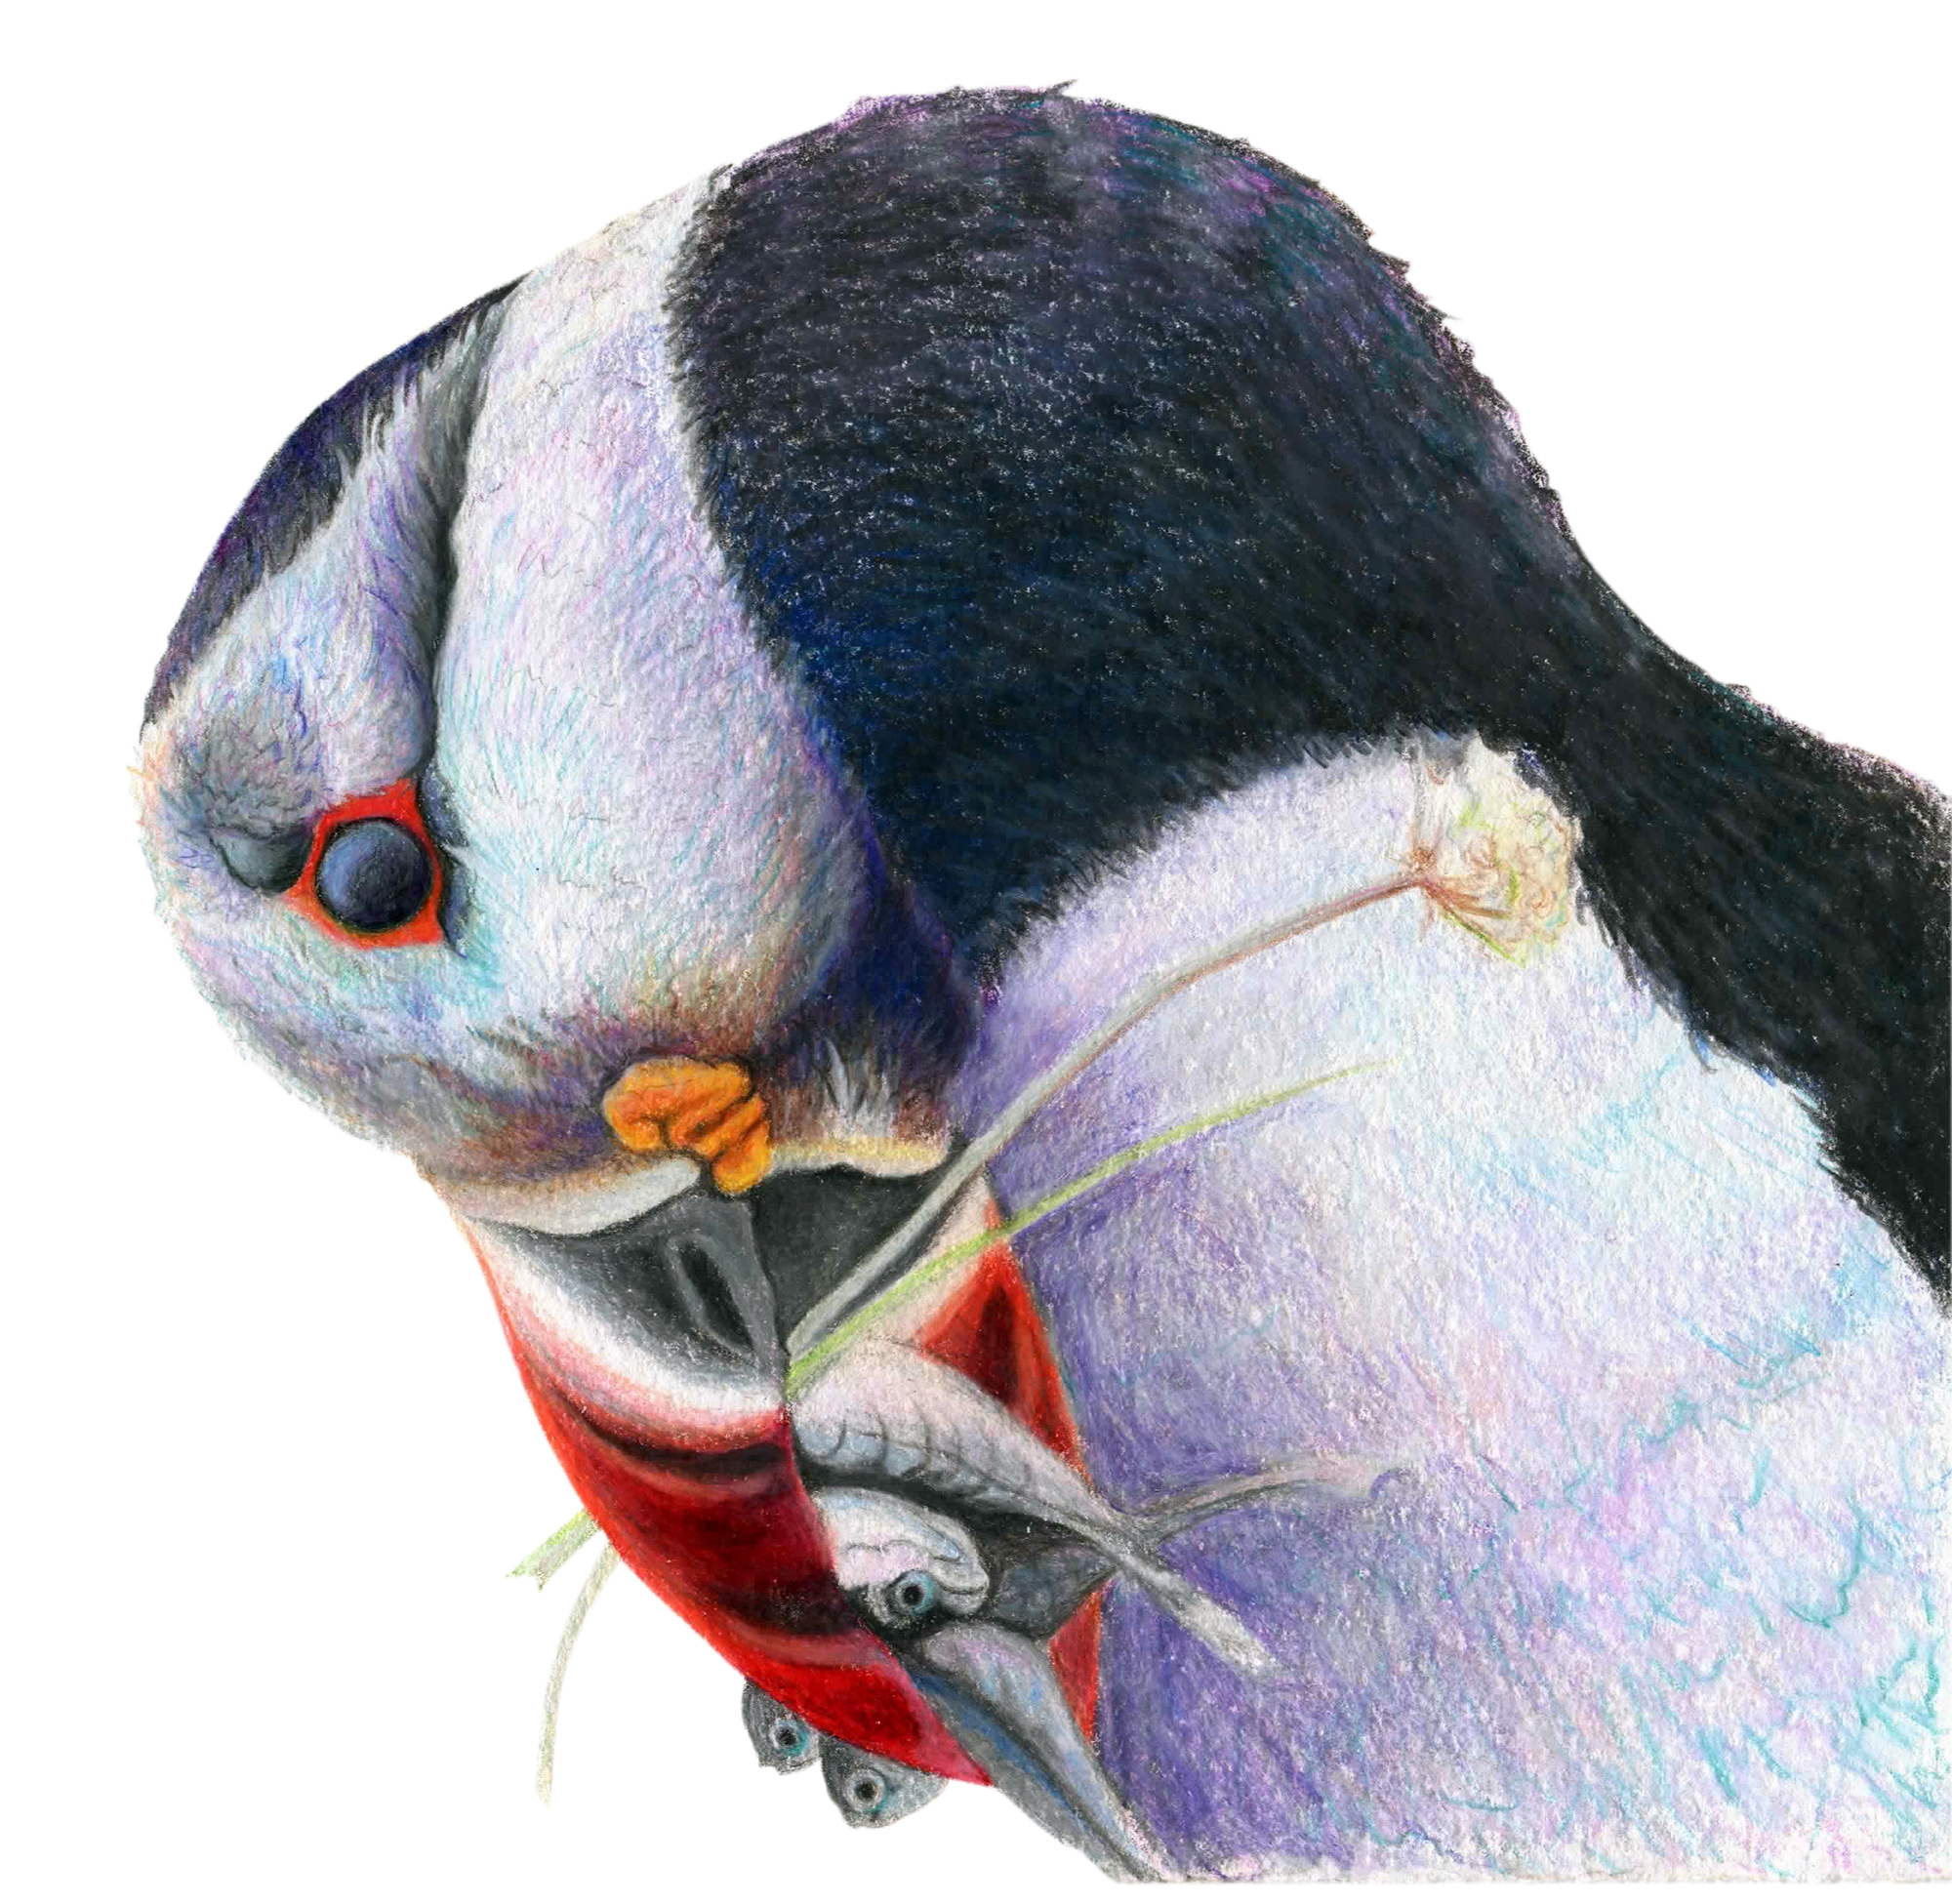 """Gone Fishin"", Atlantic Puffin Original Prismacolor Artwork by Allison Richter"